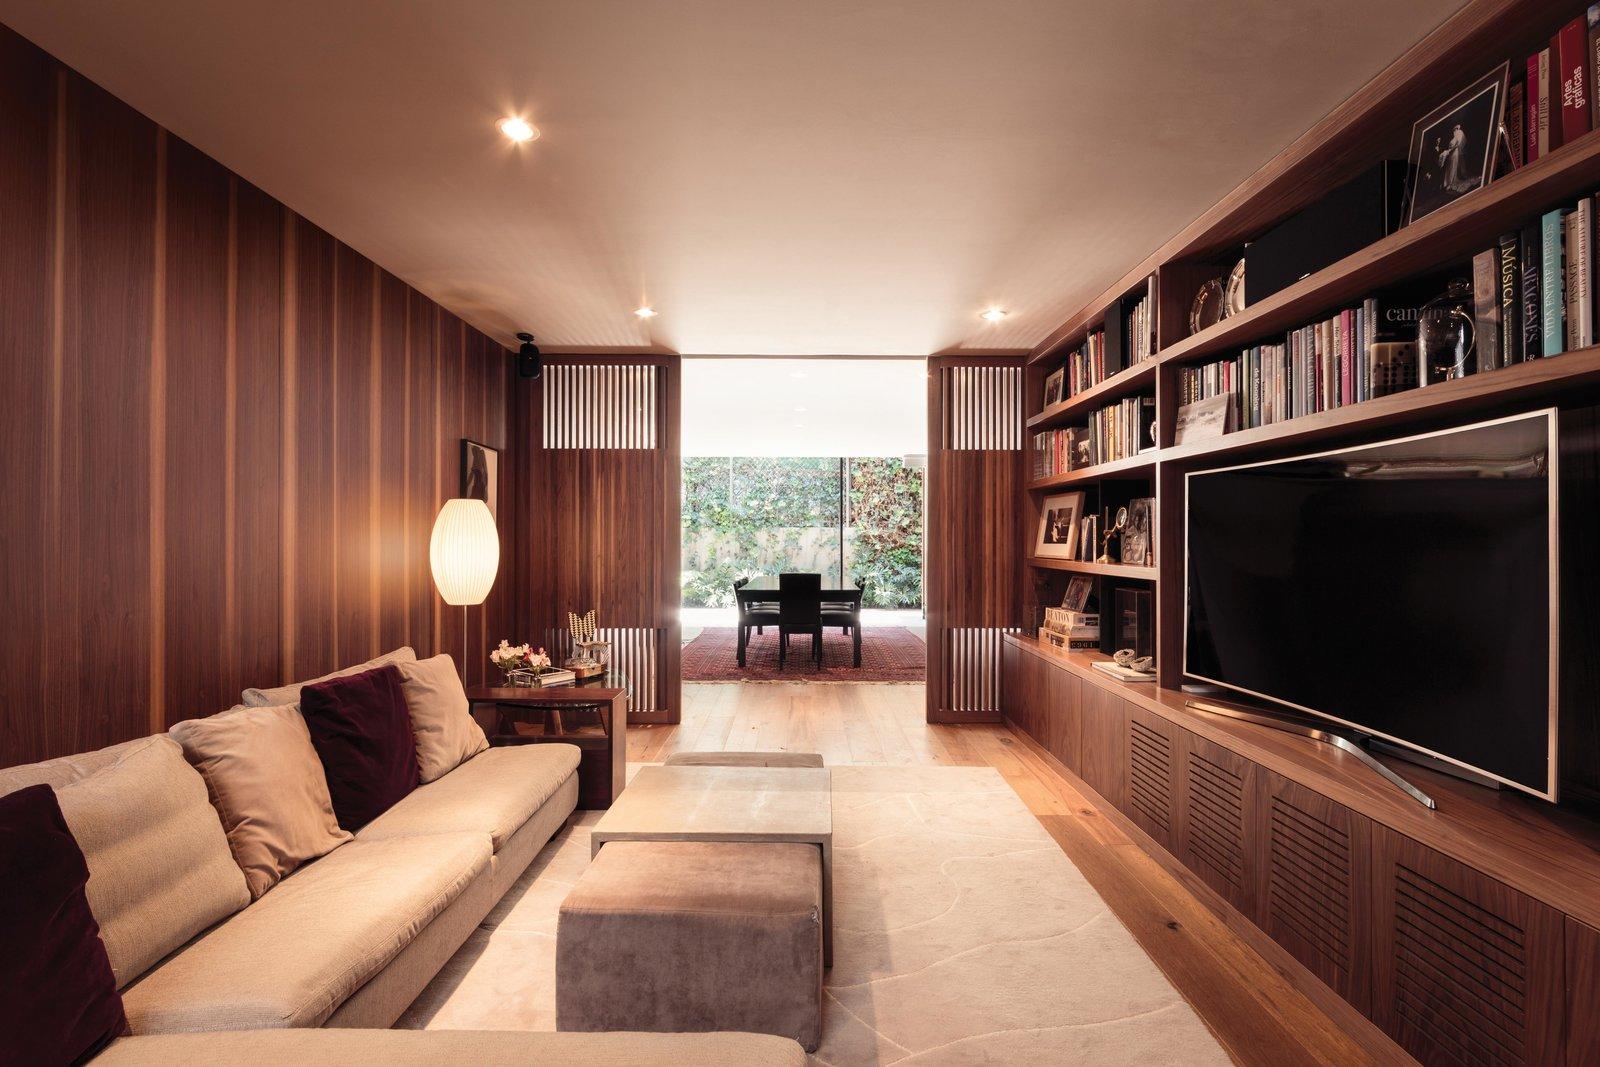 SIERRA FRIA Tagged: Living Room, Sofa, Coffee Tables, and Medium Hardwood Floor.  Sierra Fria by Jose Juan Rivera Rio